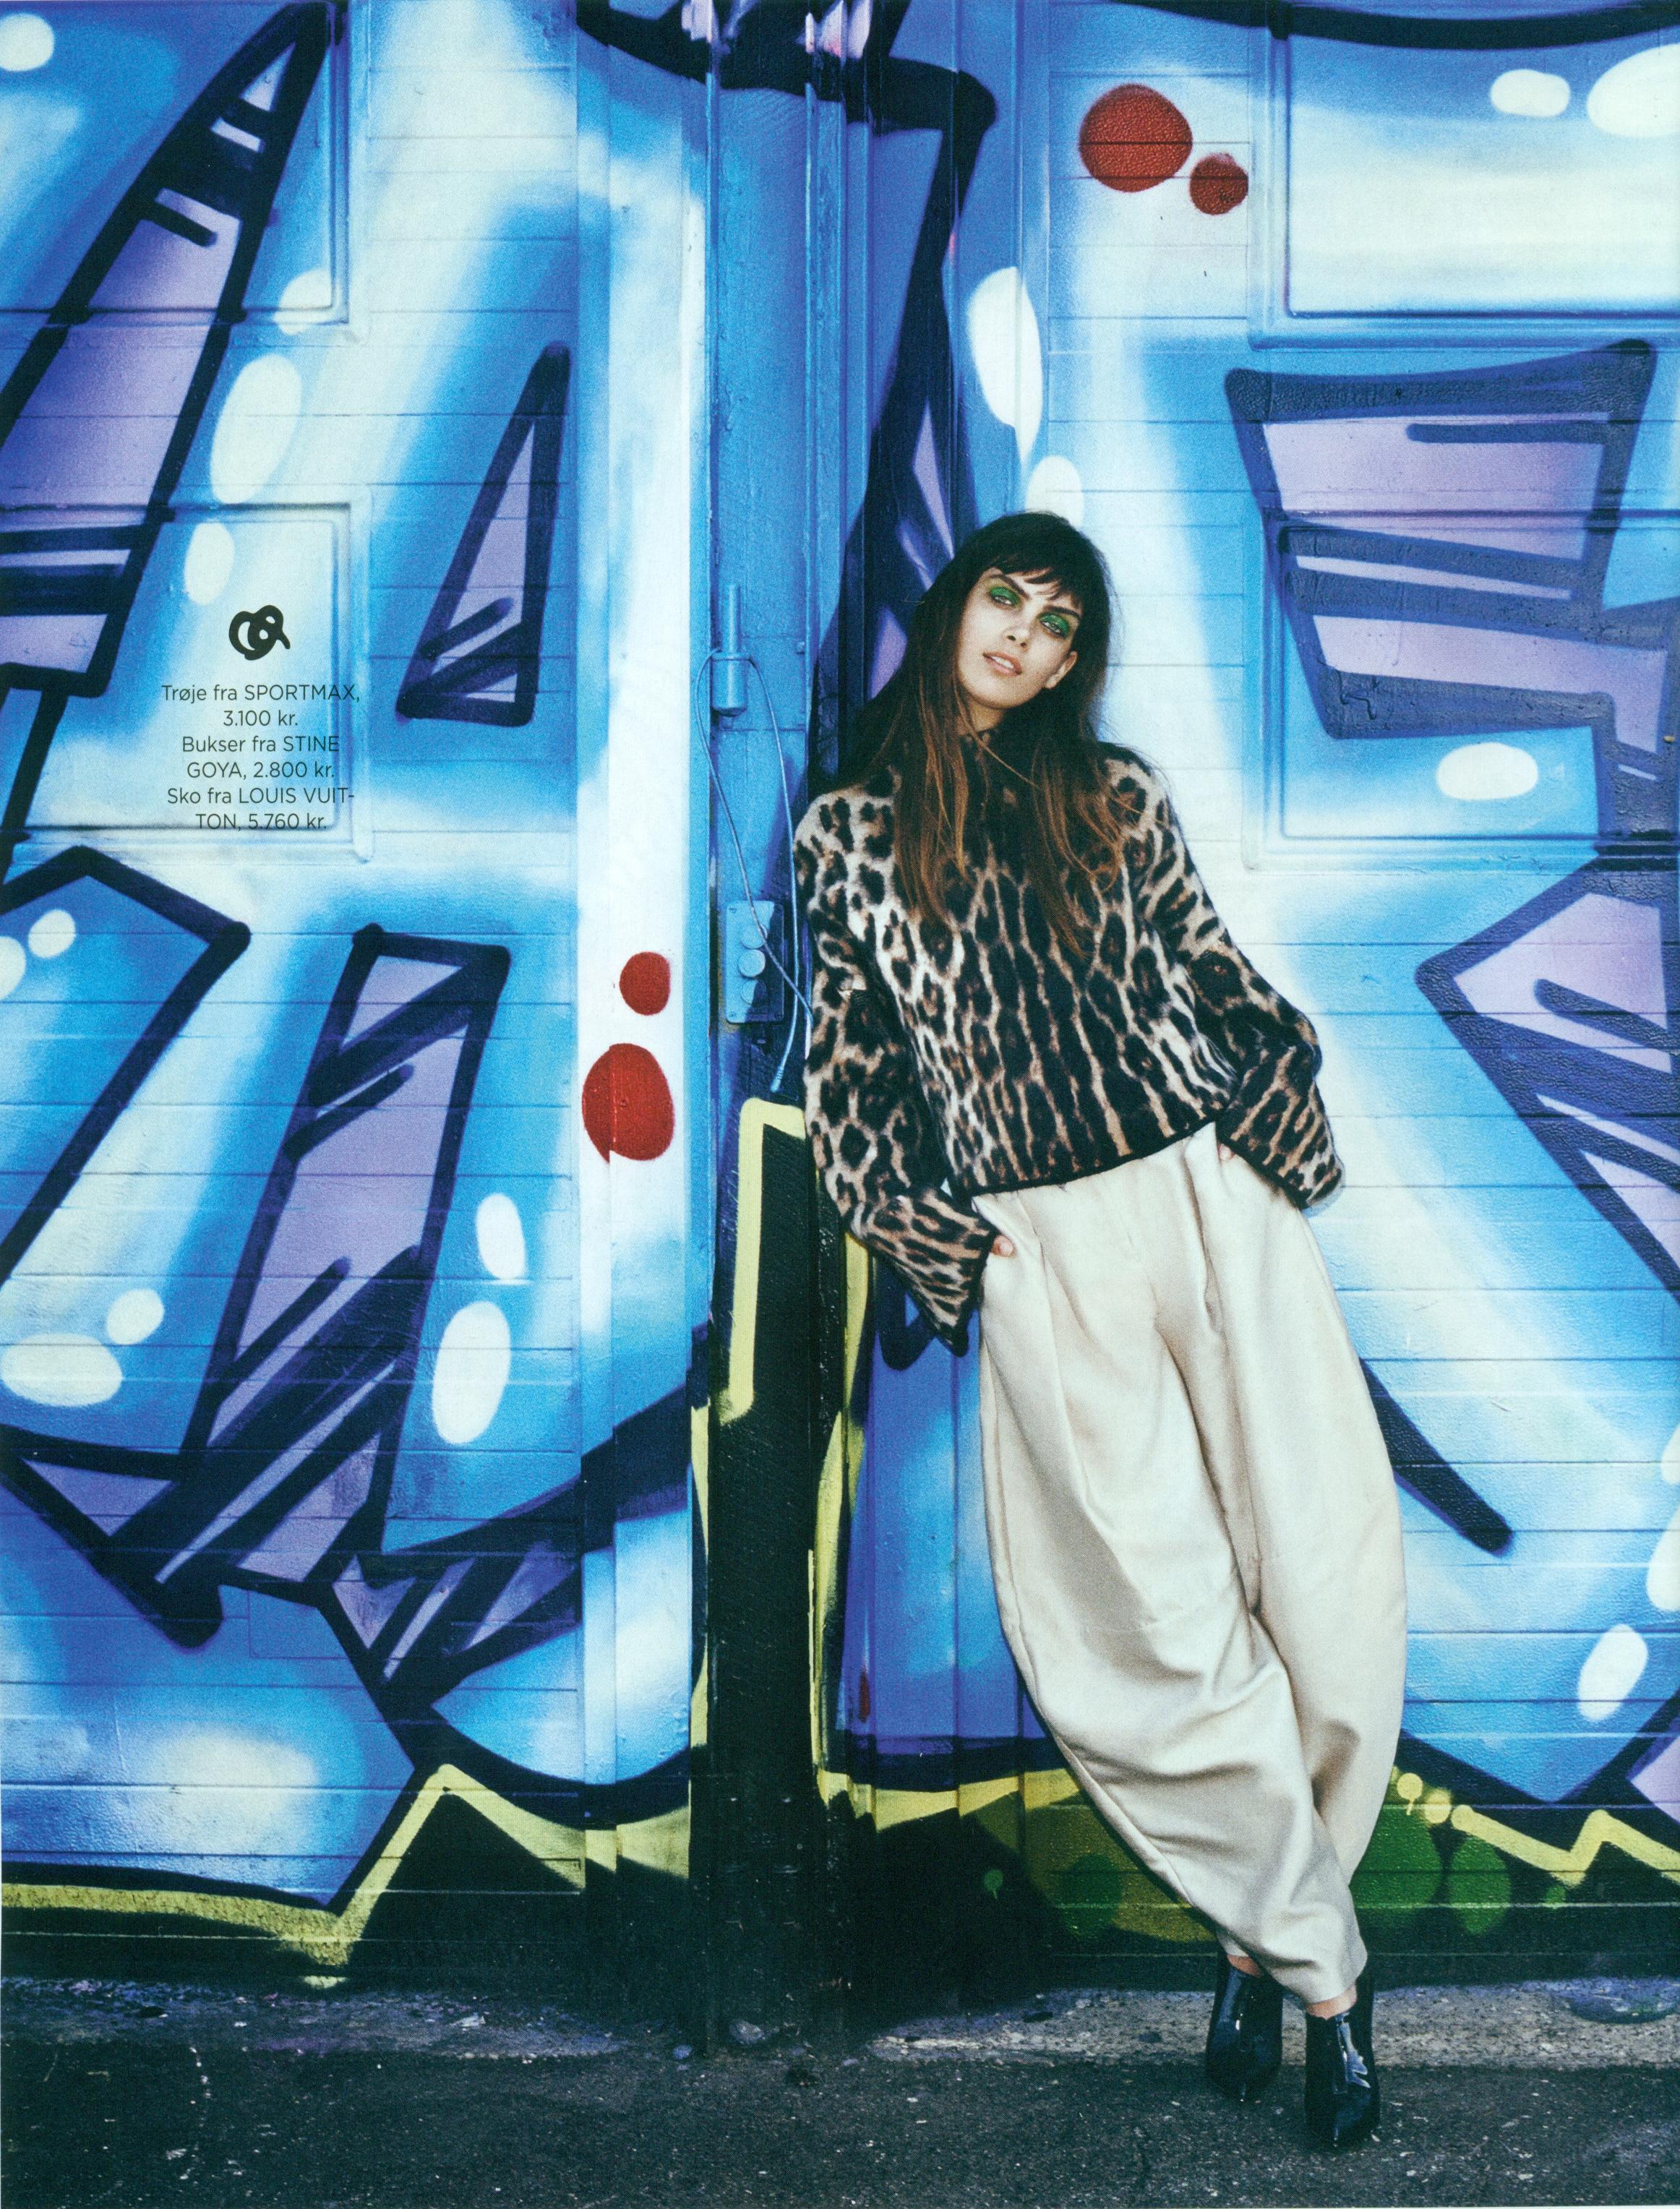 Maria Palm for Eurowoman July 2014 | EliteModelCopenhagen